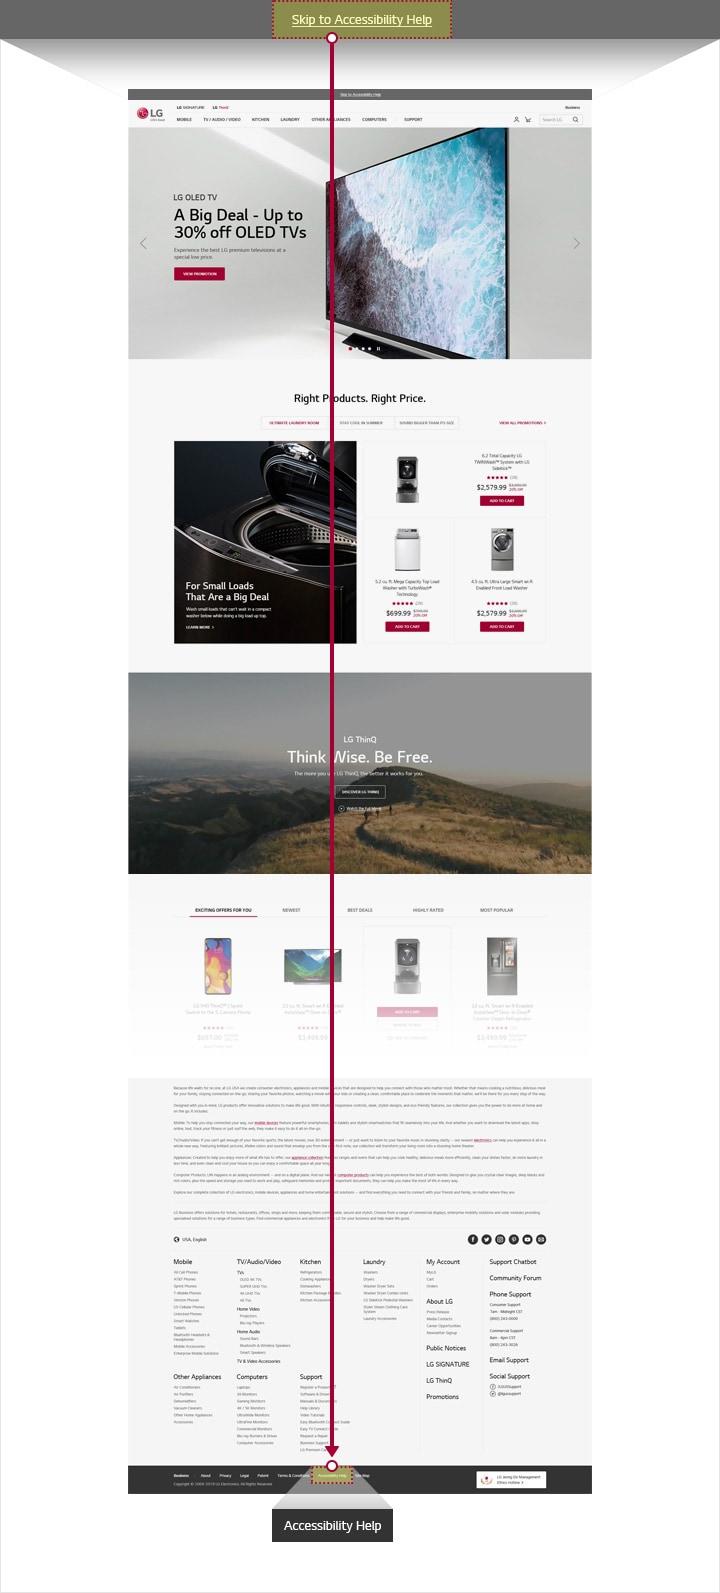 LG Accessibility: Navigate LG com | LG USA